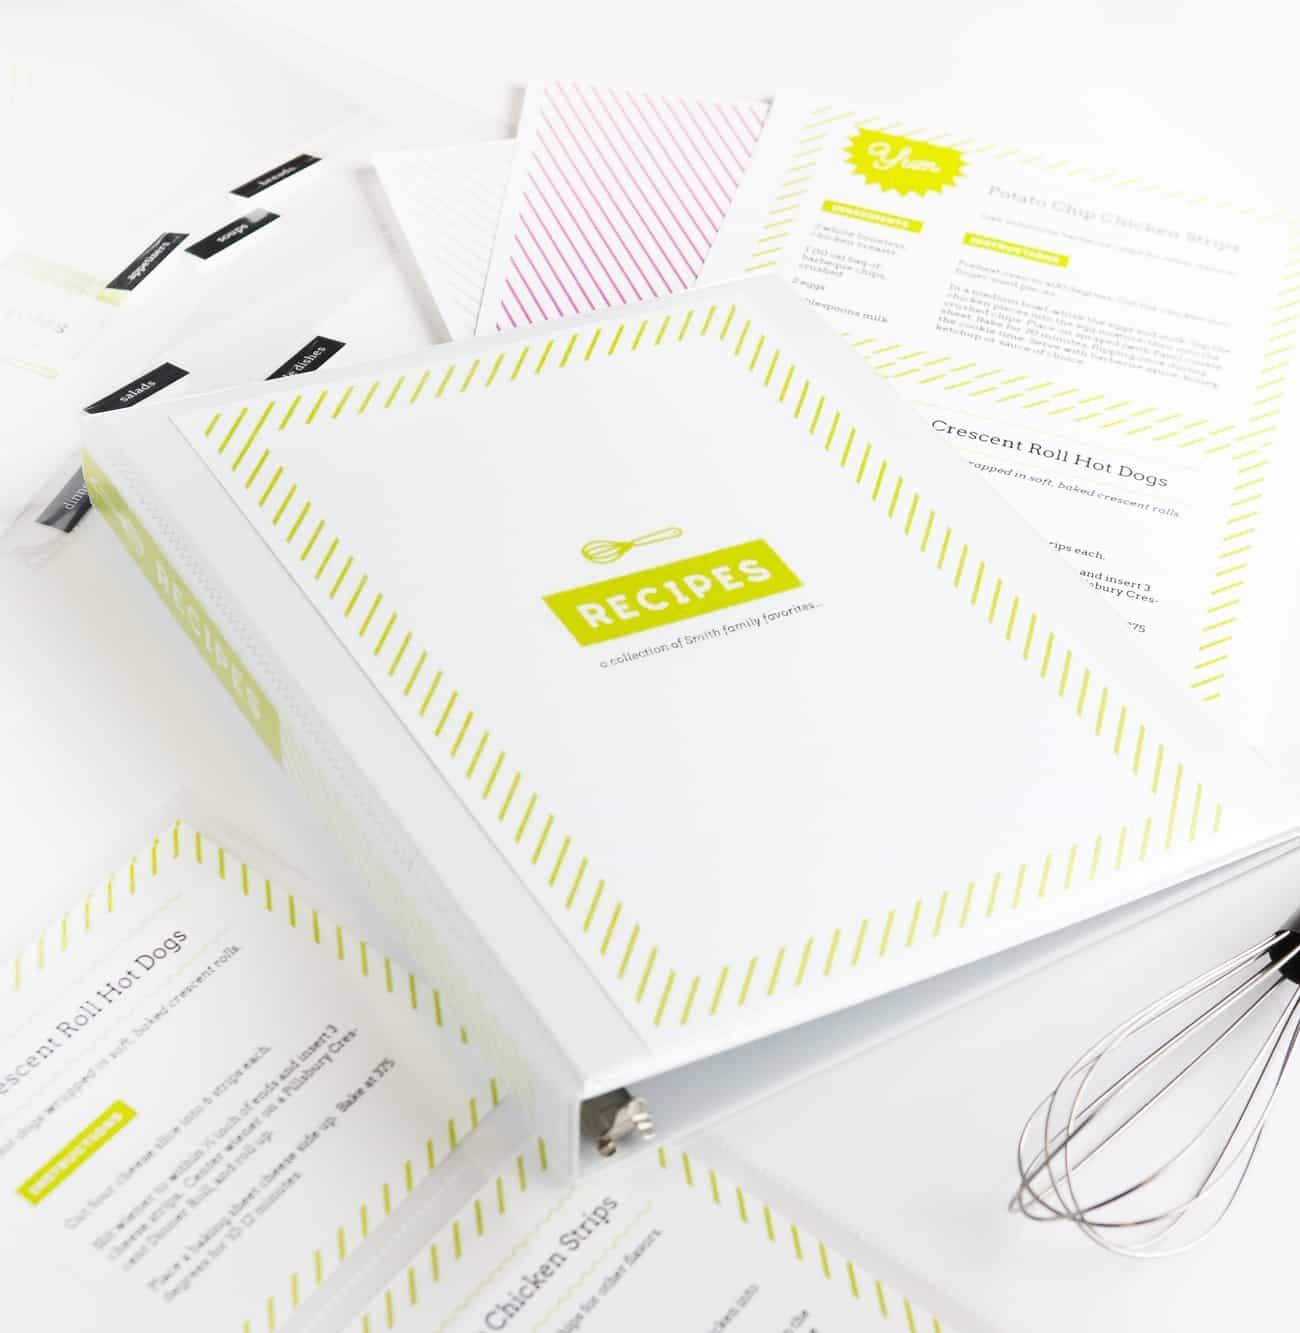 Diy Recipe Book (With Free Printable Recipe Binder Kit!) - Free Printable Recipe Page Template